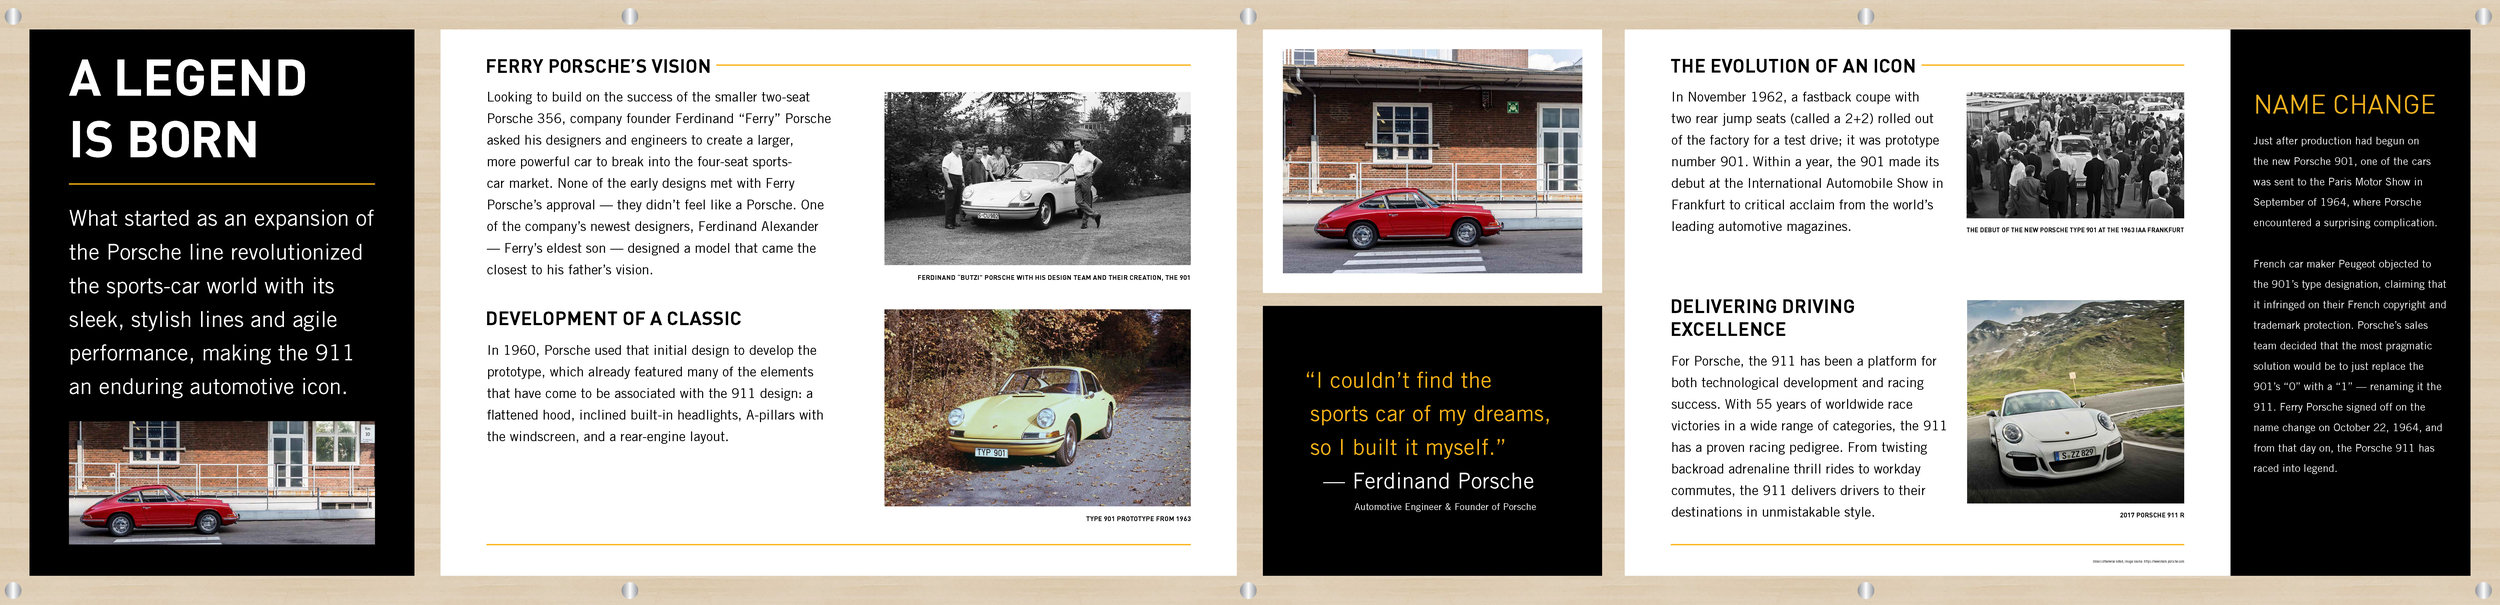 Porsche_Interpretive Panels_v11_Page_1.jpg